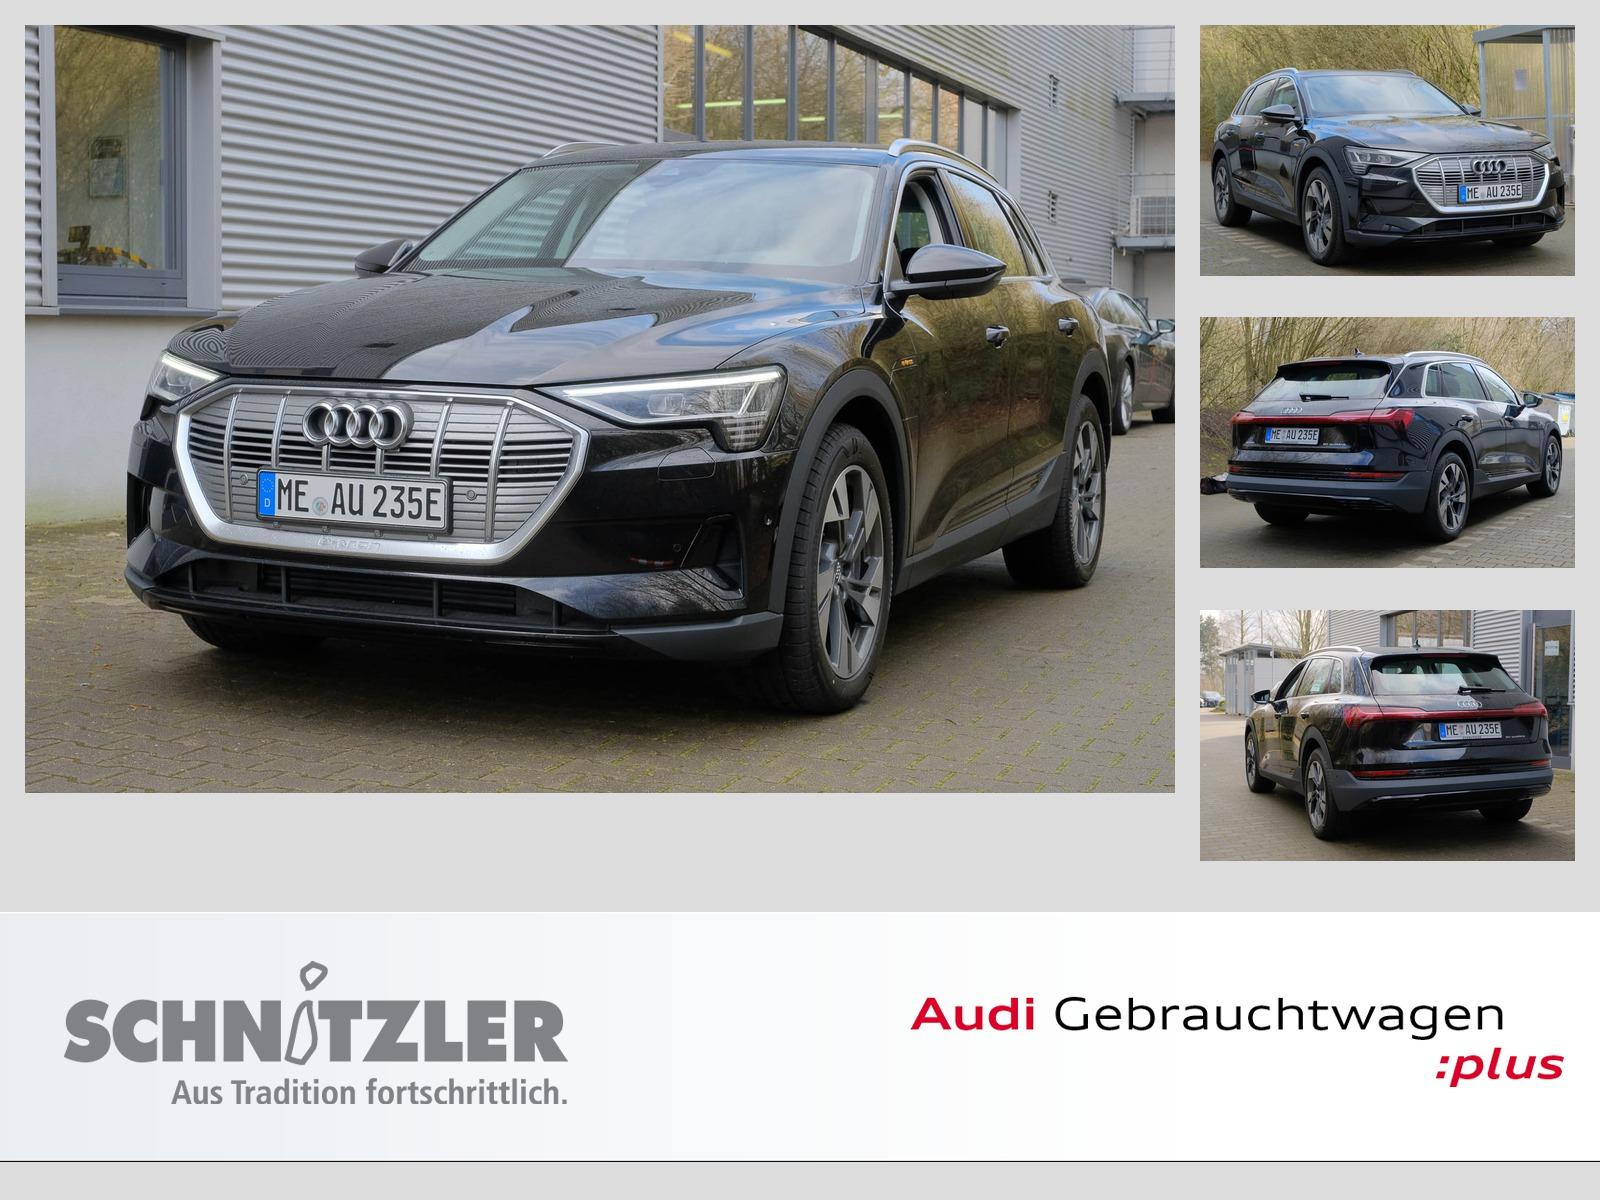 Audi e-tron 50 quattro Navi+/LED/DAB/ACC/+++, Jahr 2020, Elektro